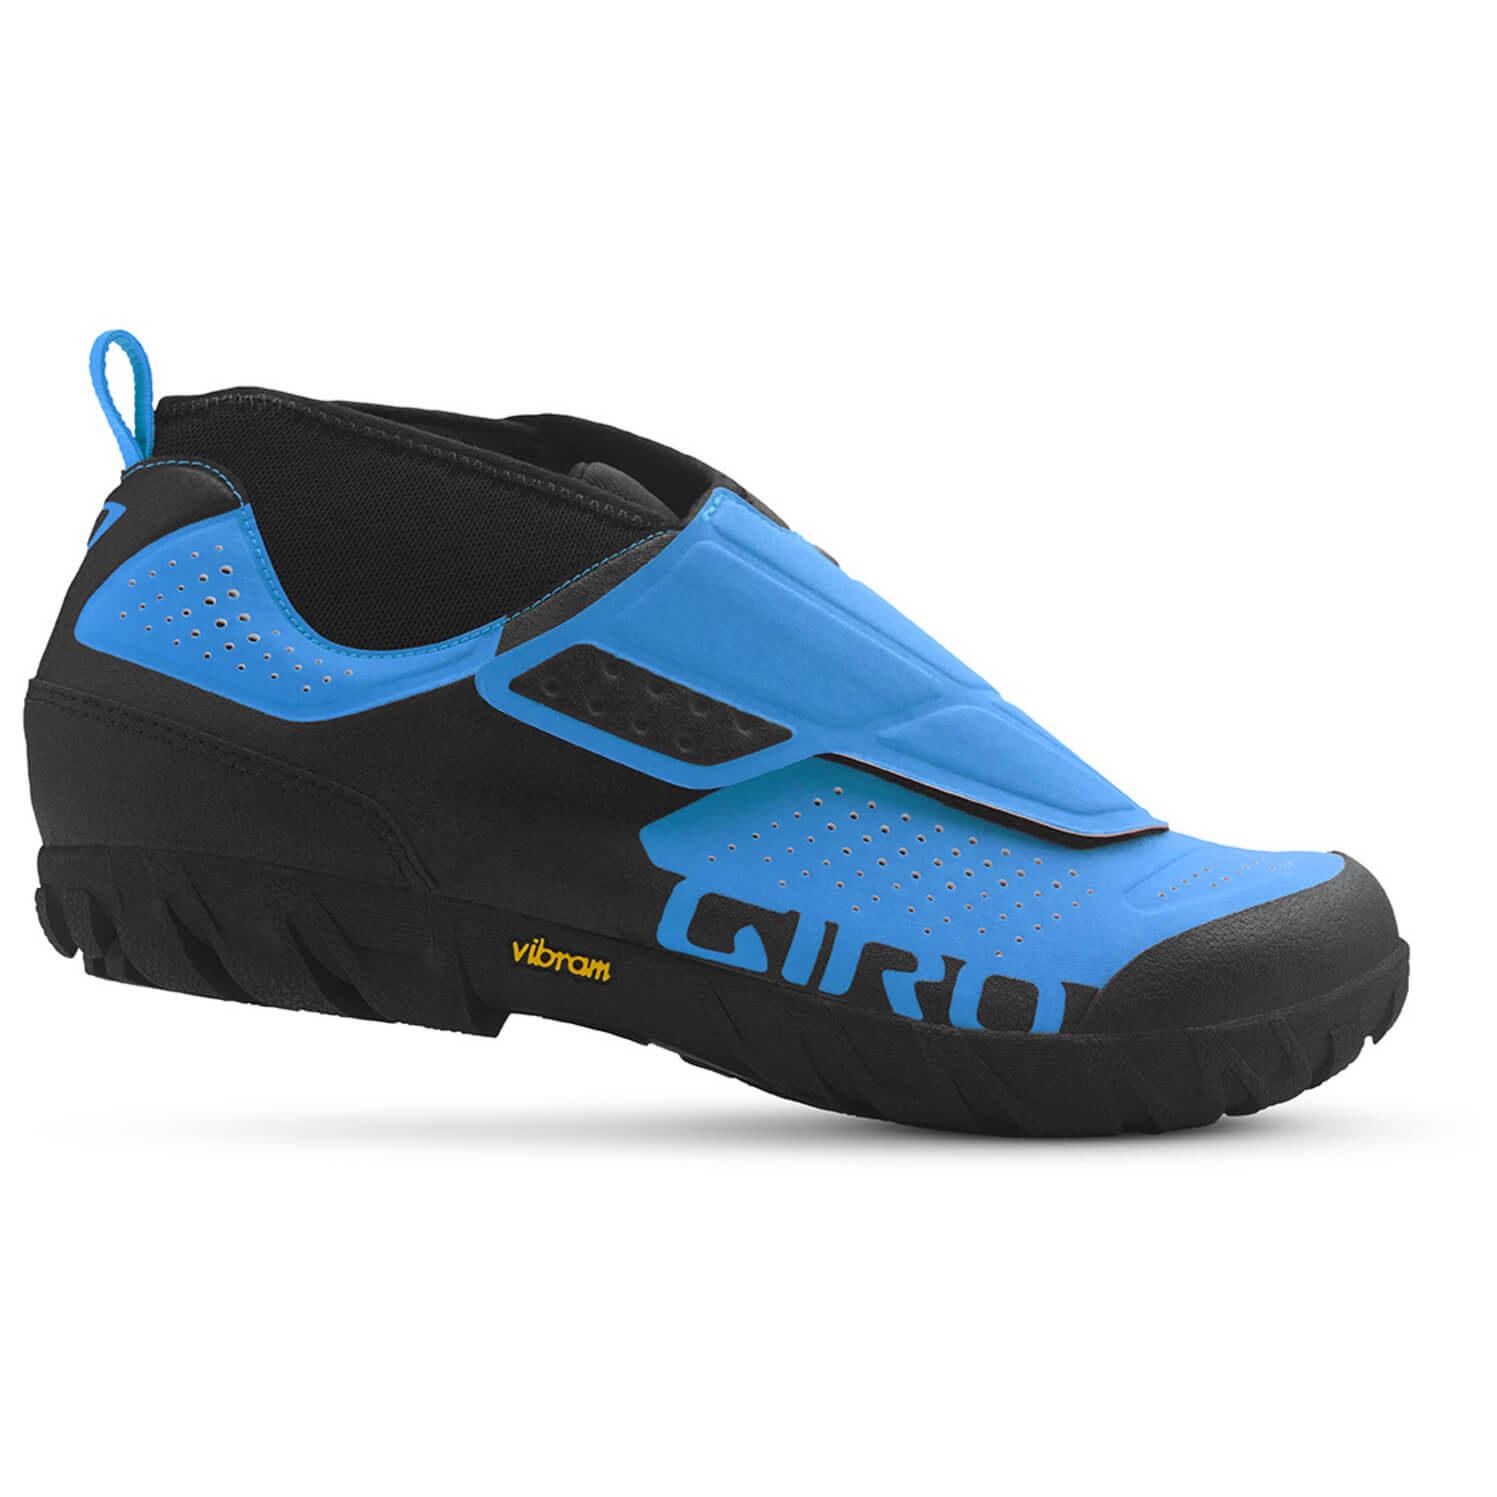 Giro - Terraduro Mid - Radschuhe Blue Jewel